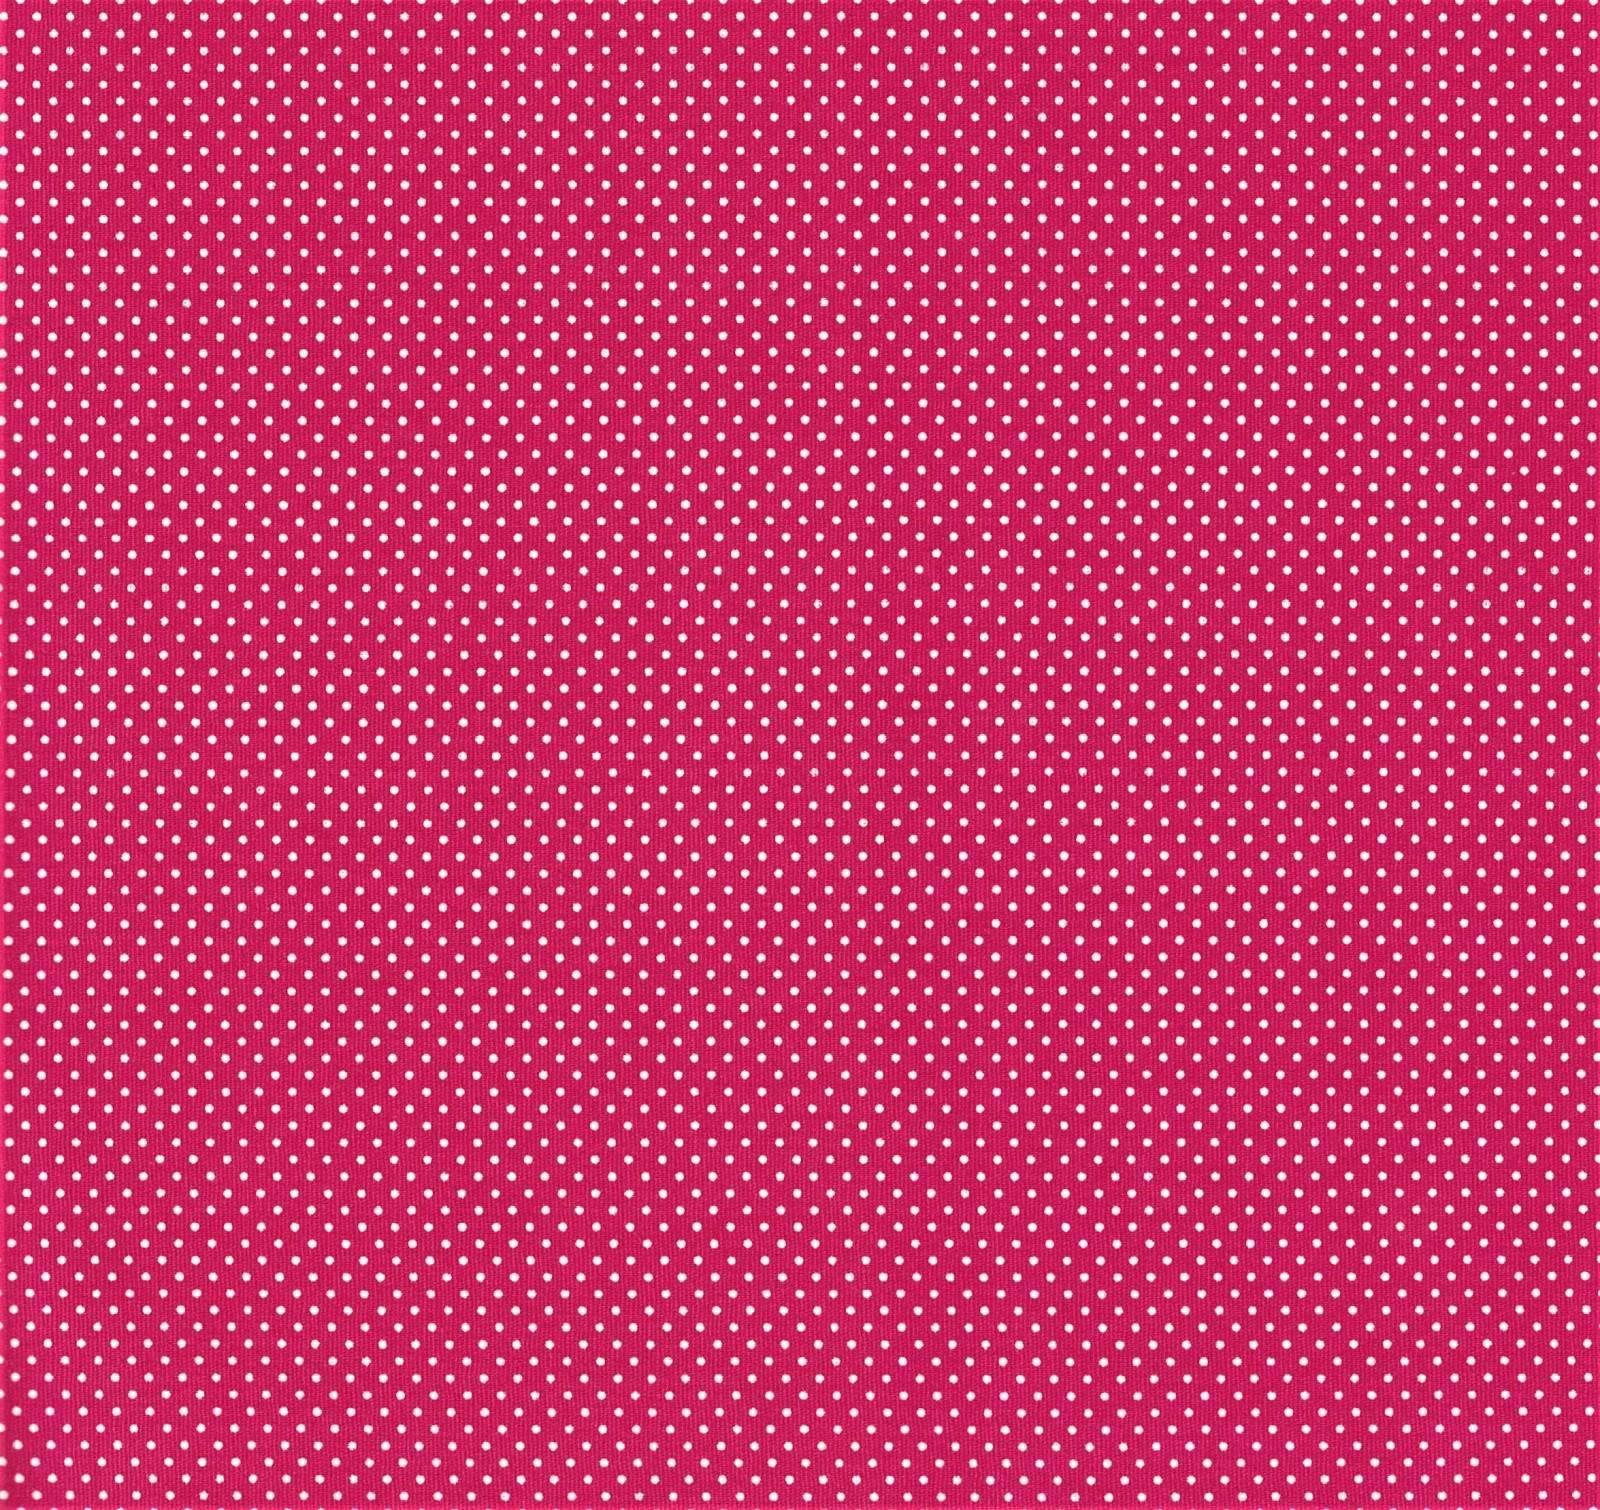 Micro poá pink Ref.1002 cor 108 Peripan - Armarinhos Nodari